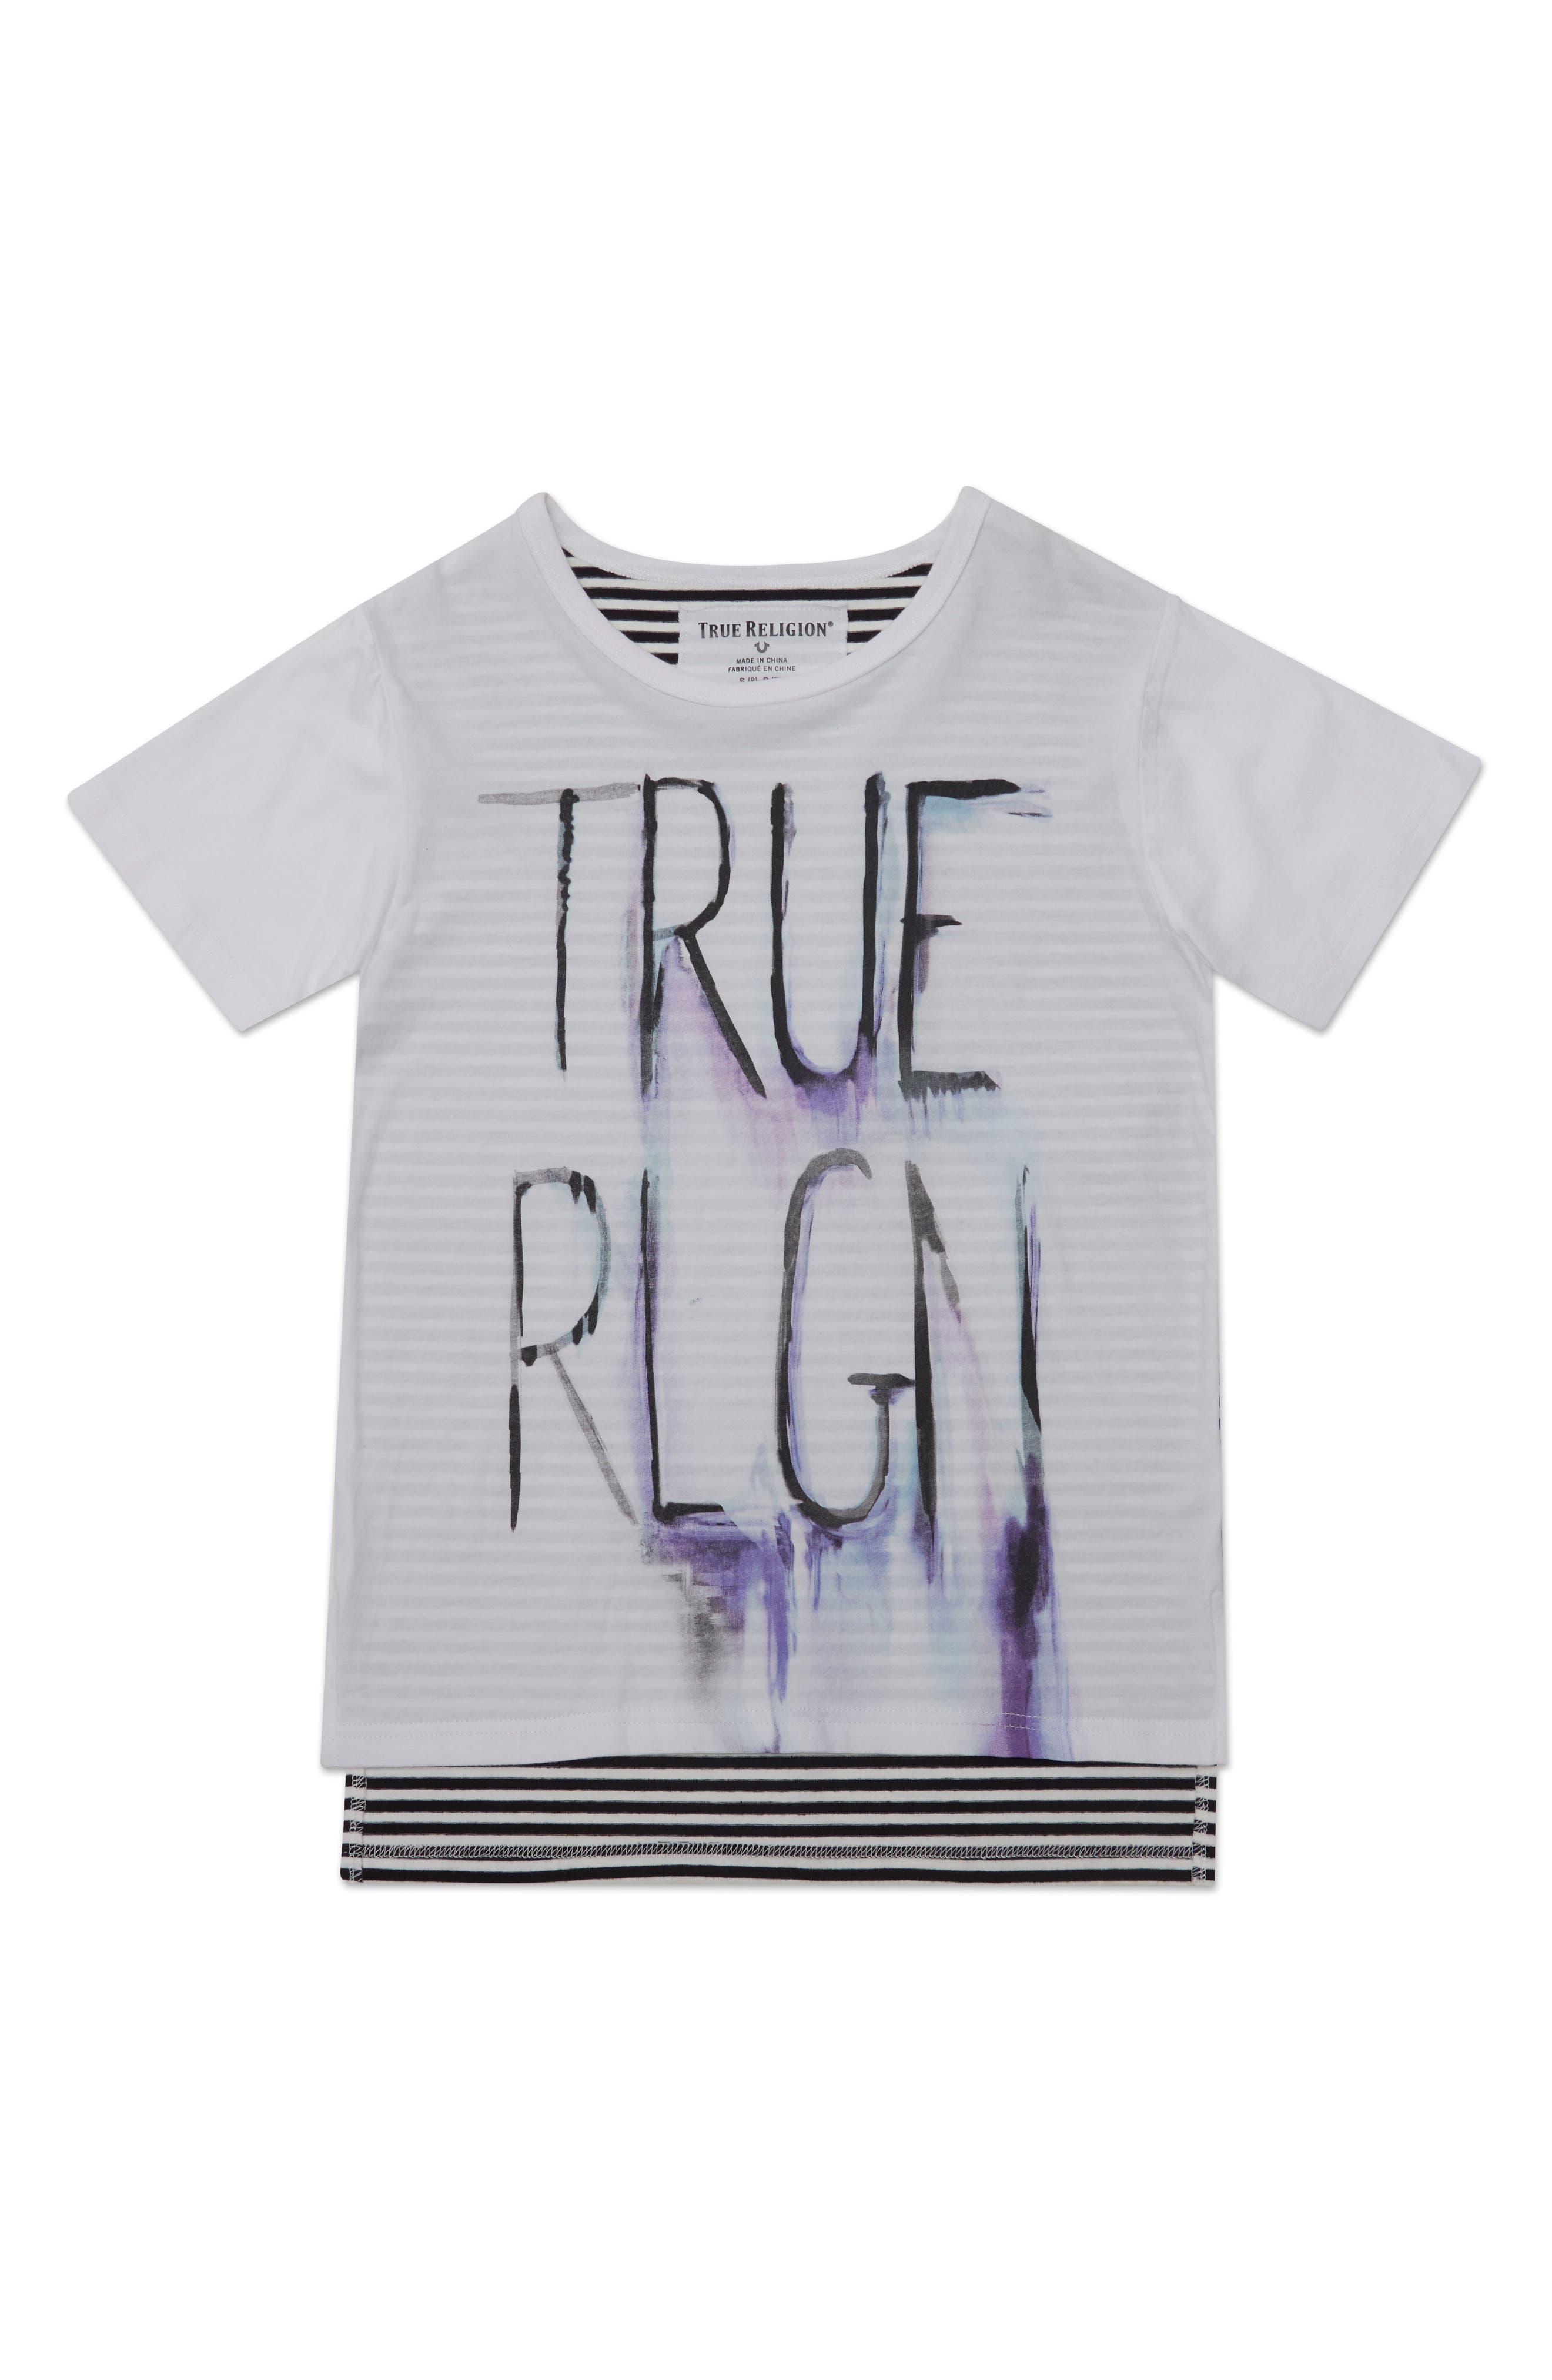 True Religion Brand Jeans Sketch Graphic T-Shirt (Toddler Boys & Little Boys)